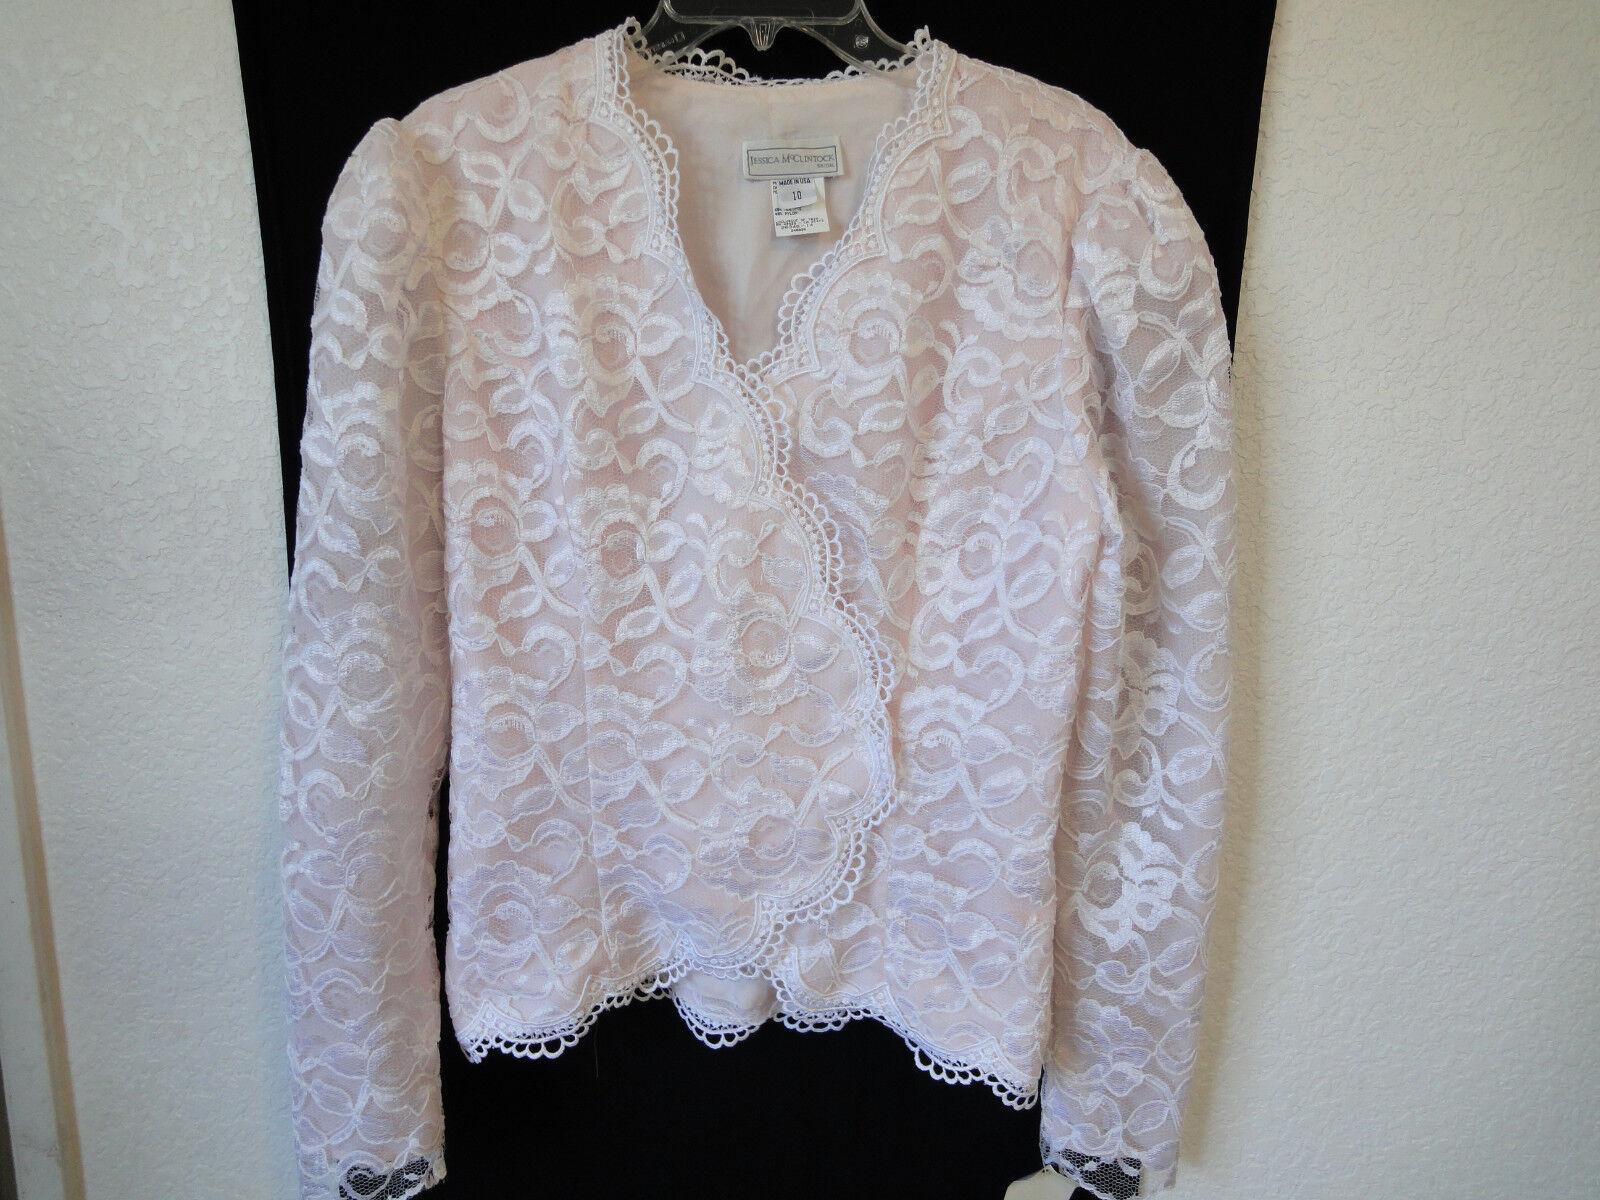 NWT- JESSICA McLINTOCK BRIDAL scallop lace taffeta top light pink size 10